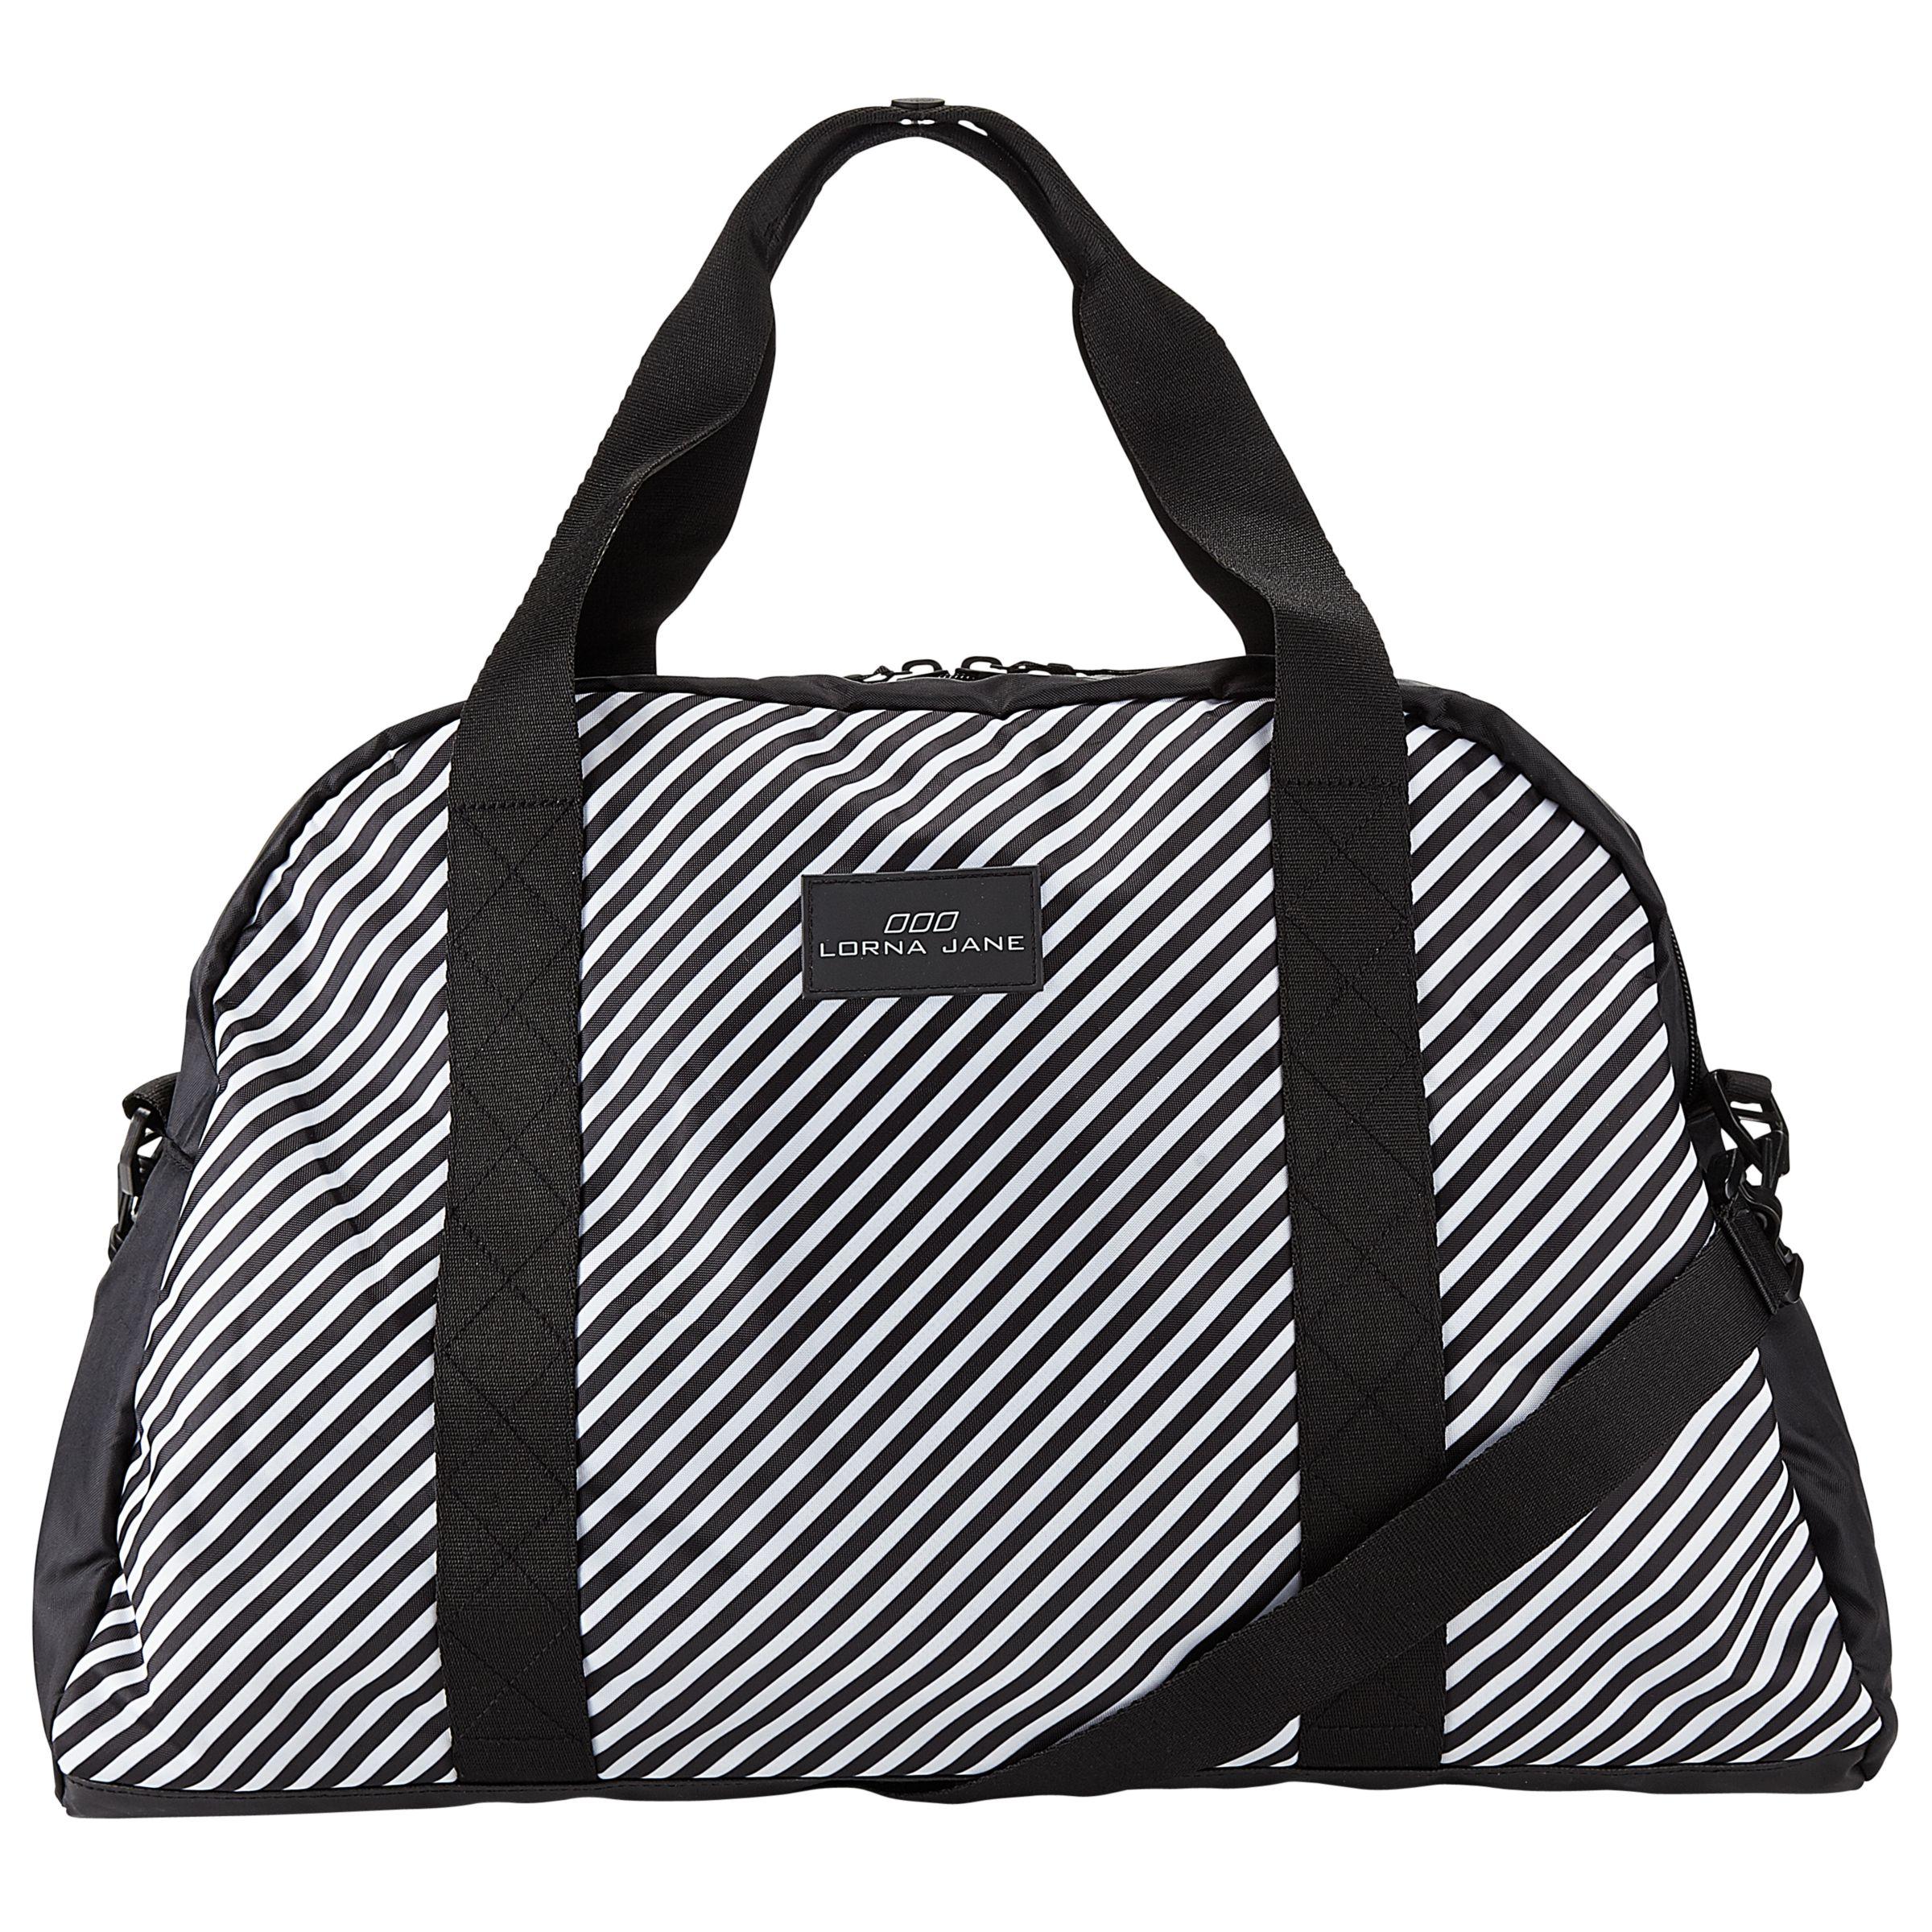 Lorna Jane Stripe Gym Bag Black White At John Lewis Partners